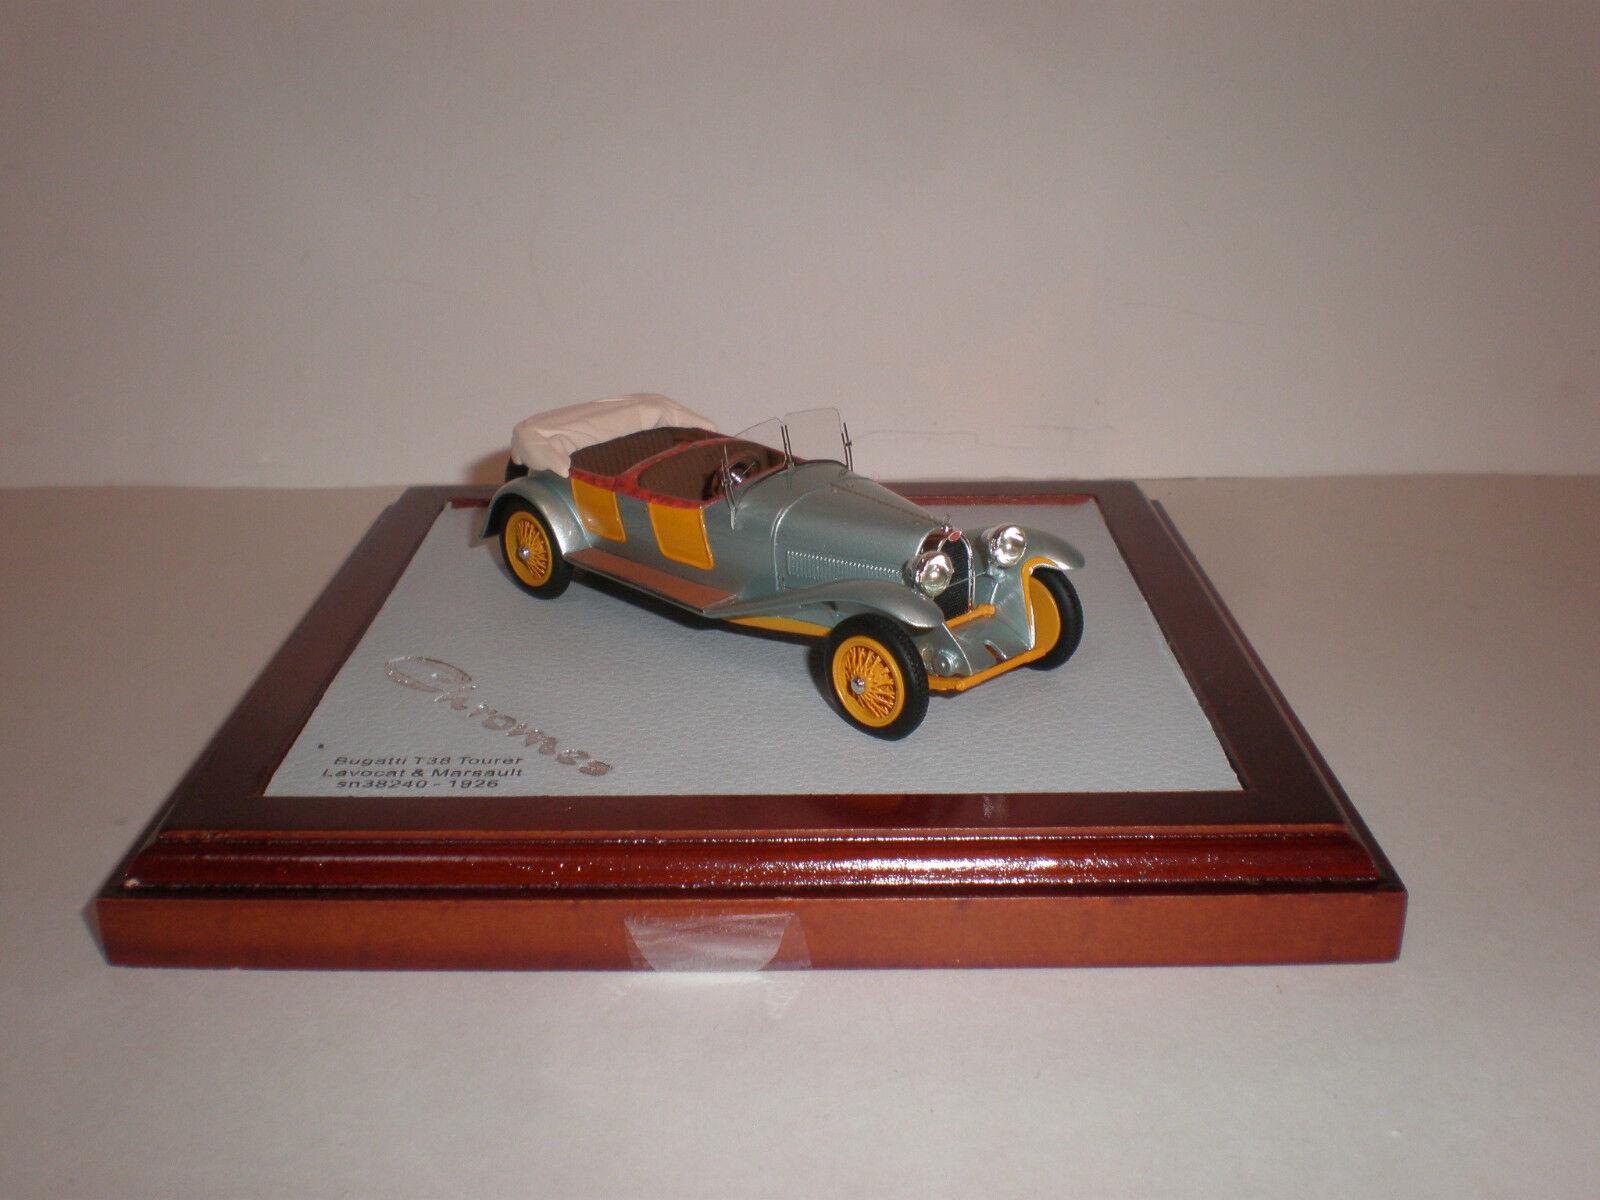 Ilario 1926 Bugatti Tipo 38 Tourer Lavocat & marsault Chro 035 abierto